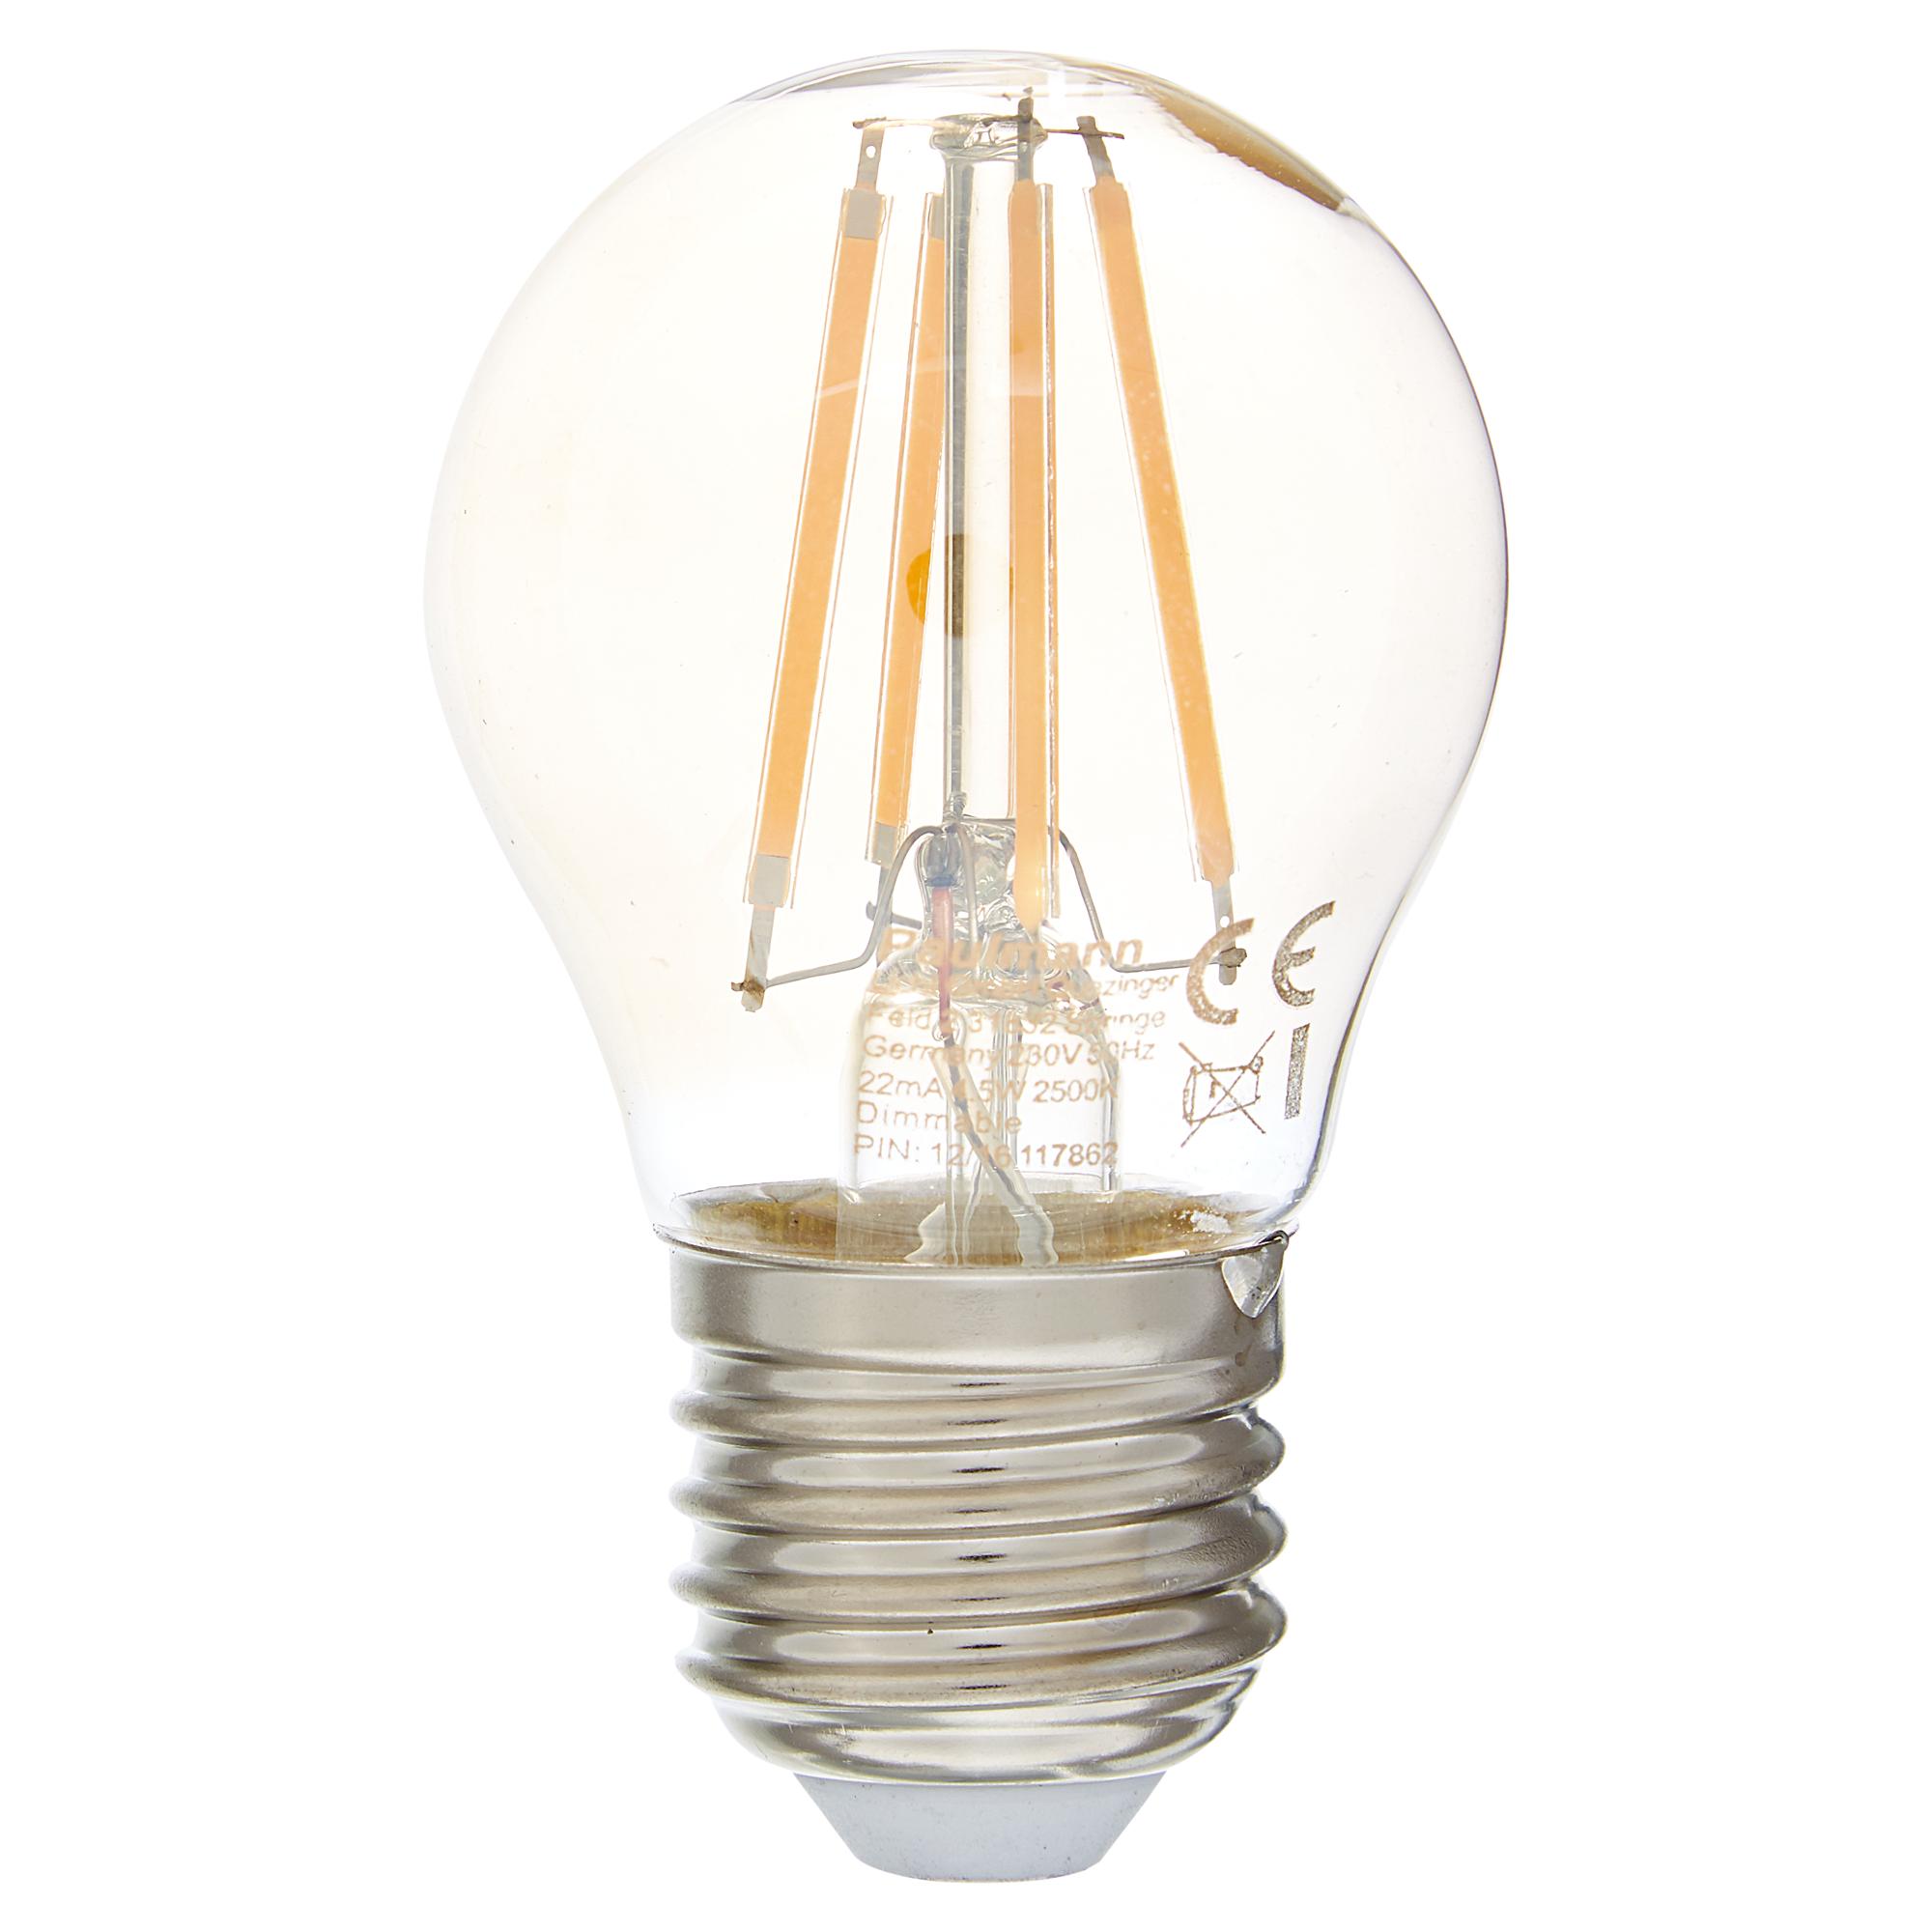 LED Lampe Tropfen Golden 4,5 W Ø 45 X 83 Mm